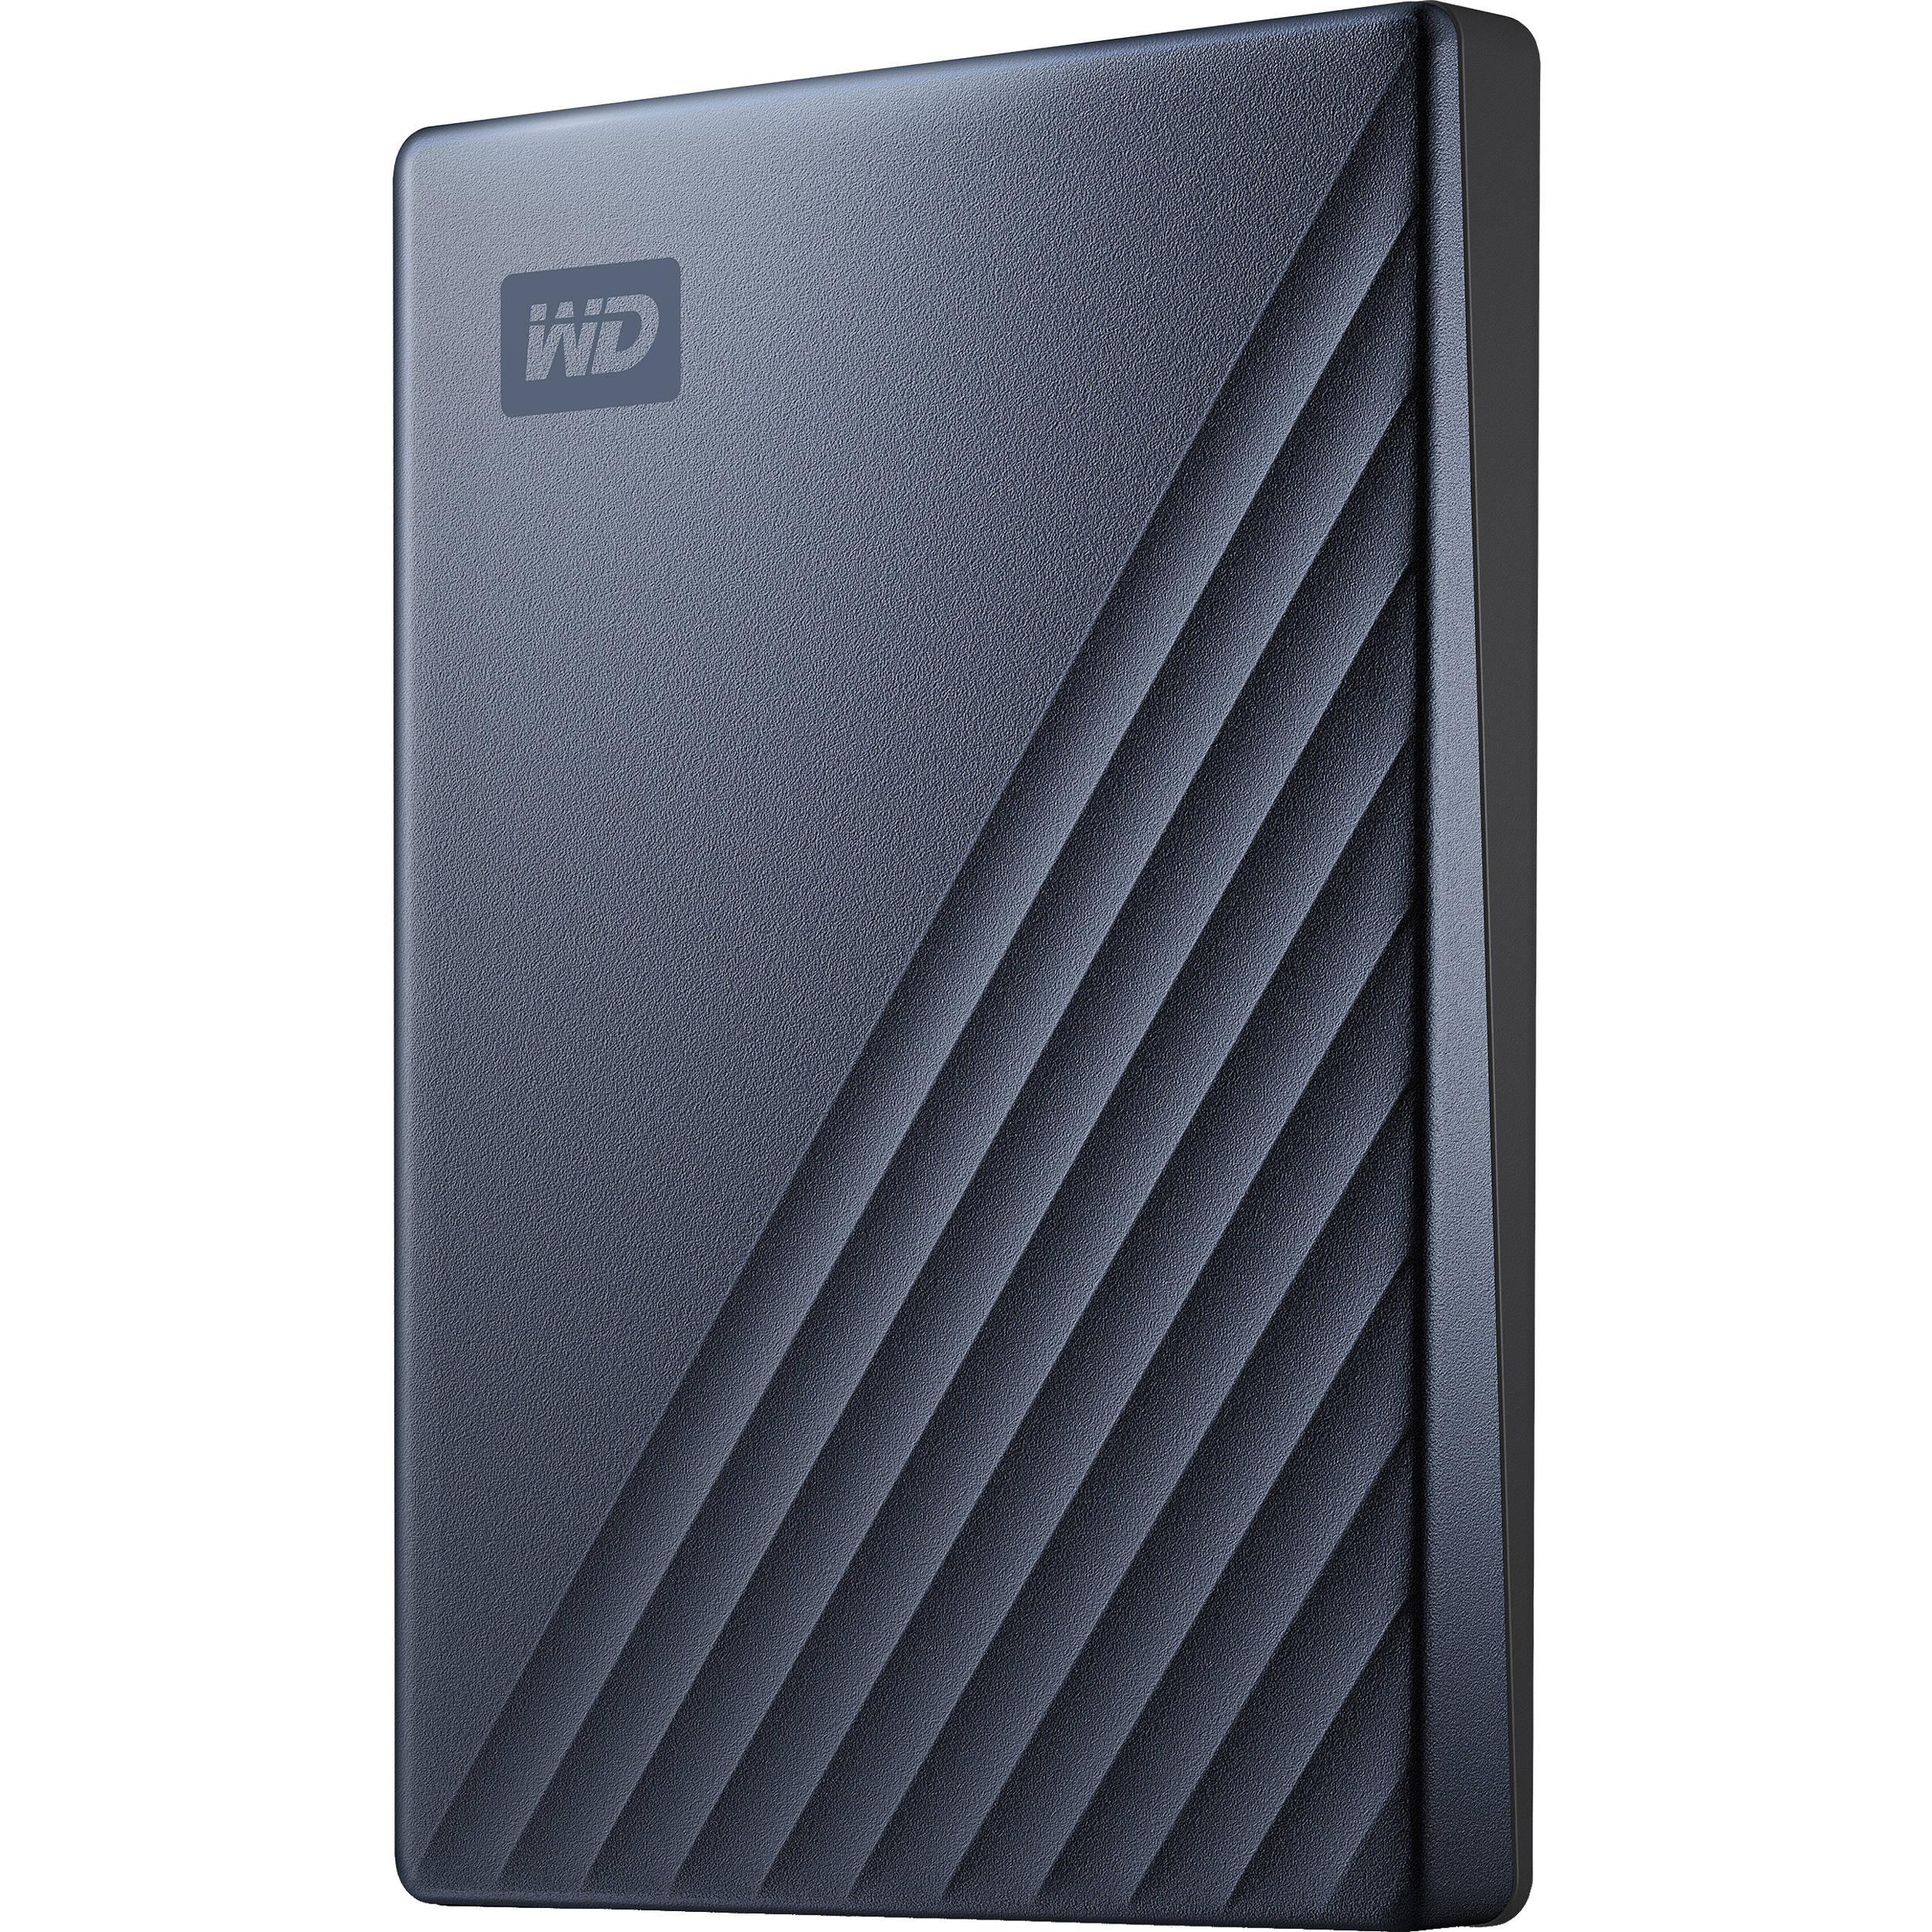 WD 2TB My Passport Ultra USB 3 0 Type-C External Hard Drive (Blue)